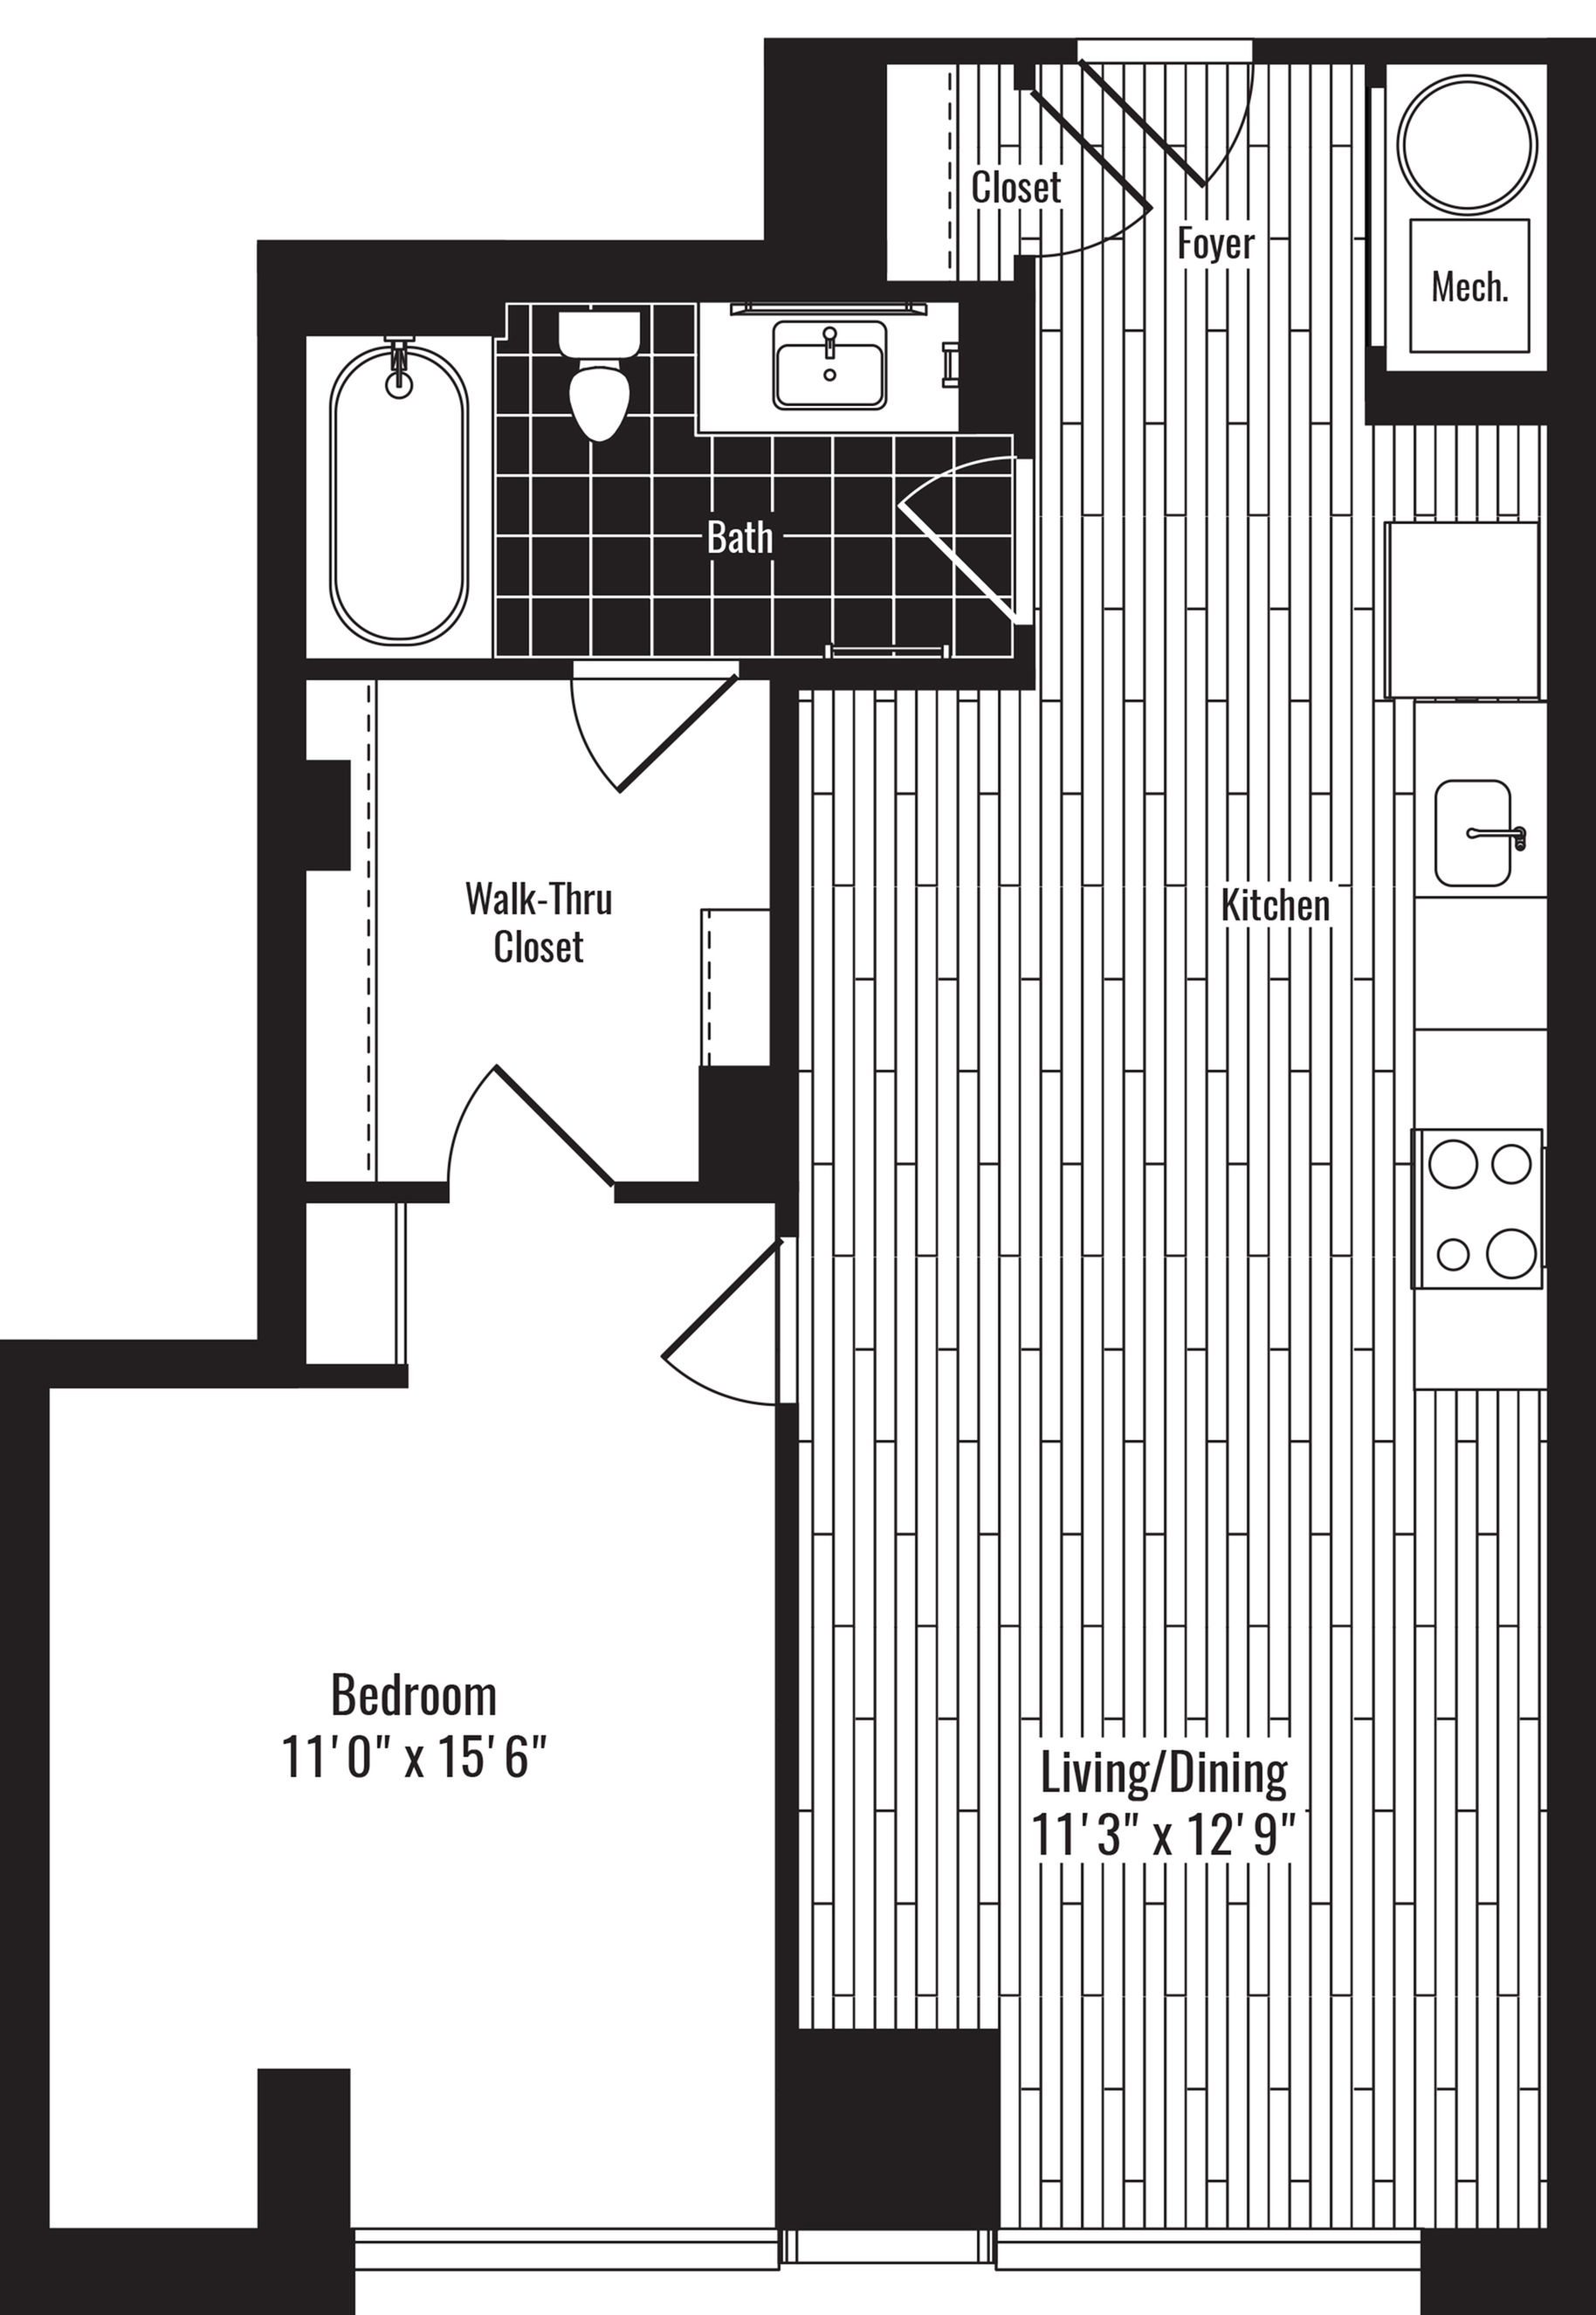 712 square foot one bedroom one bath apartment floorplan image